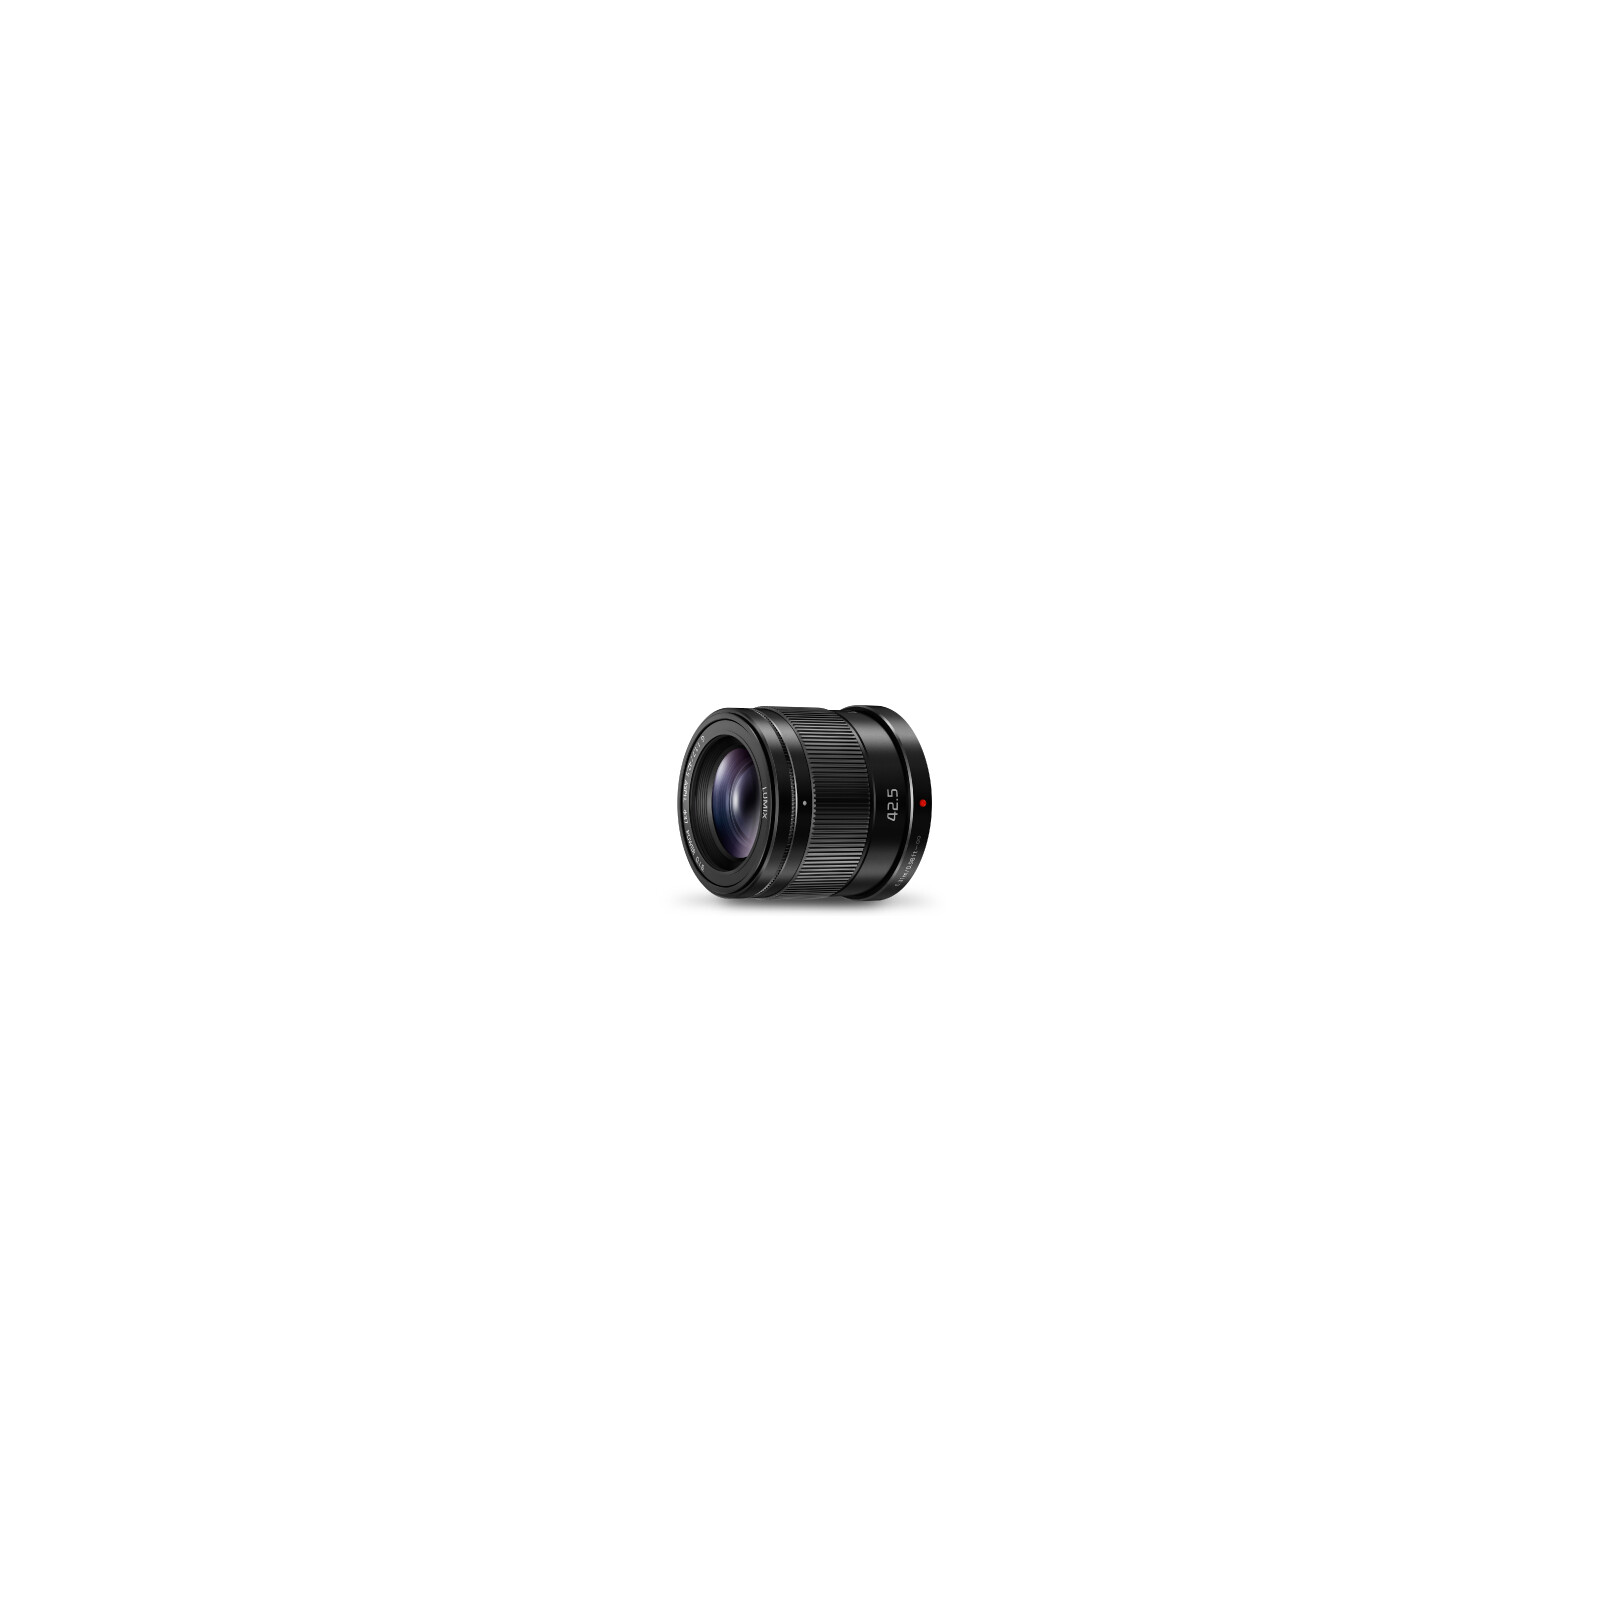 Panasonic 43/1,7 Lumix G + UV Filter